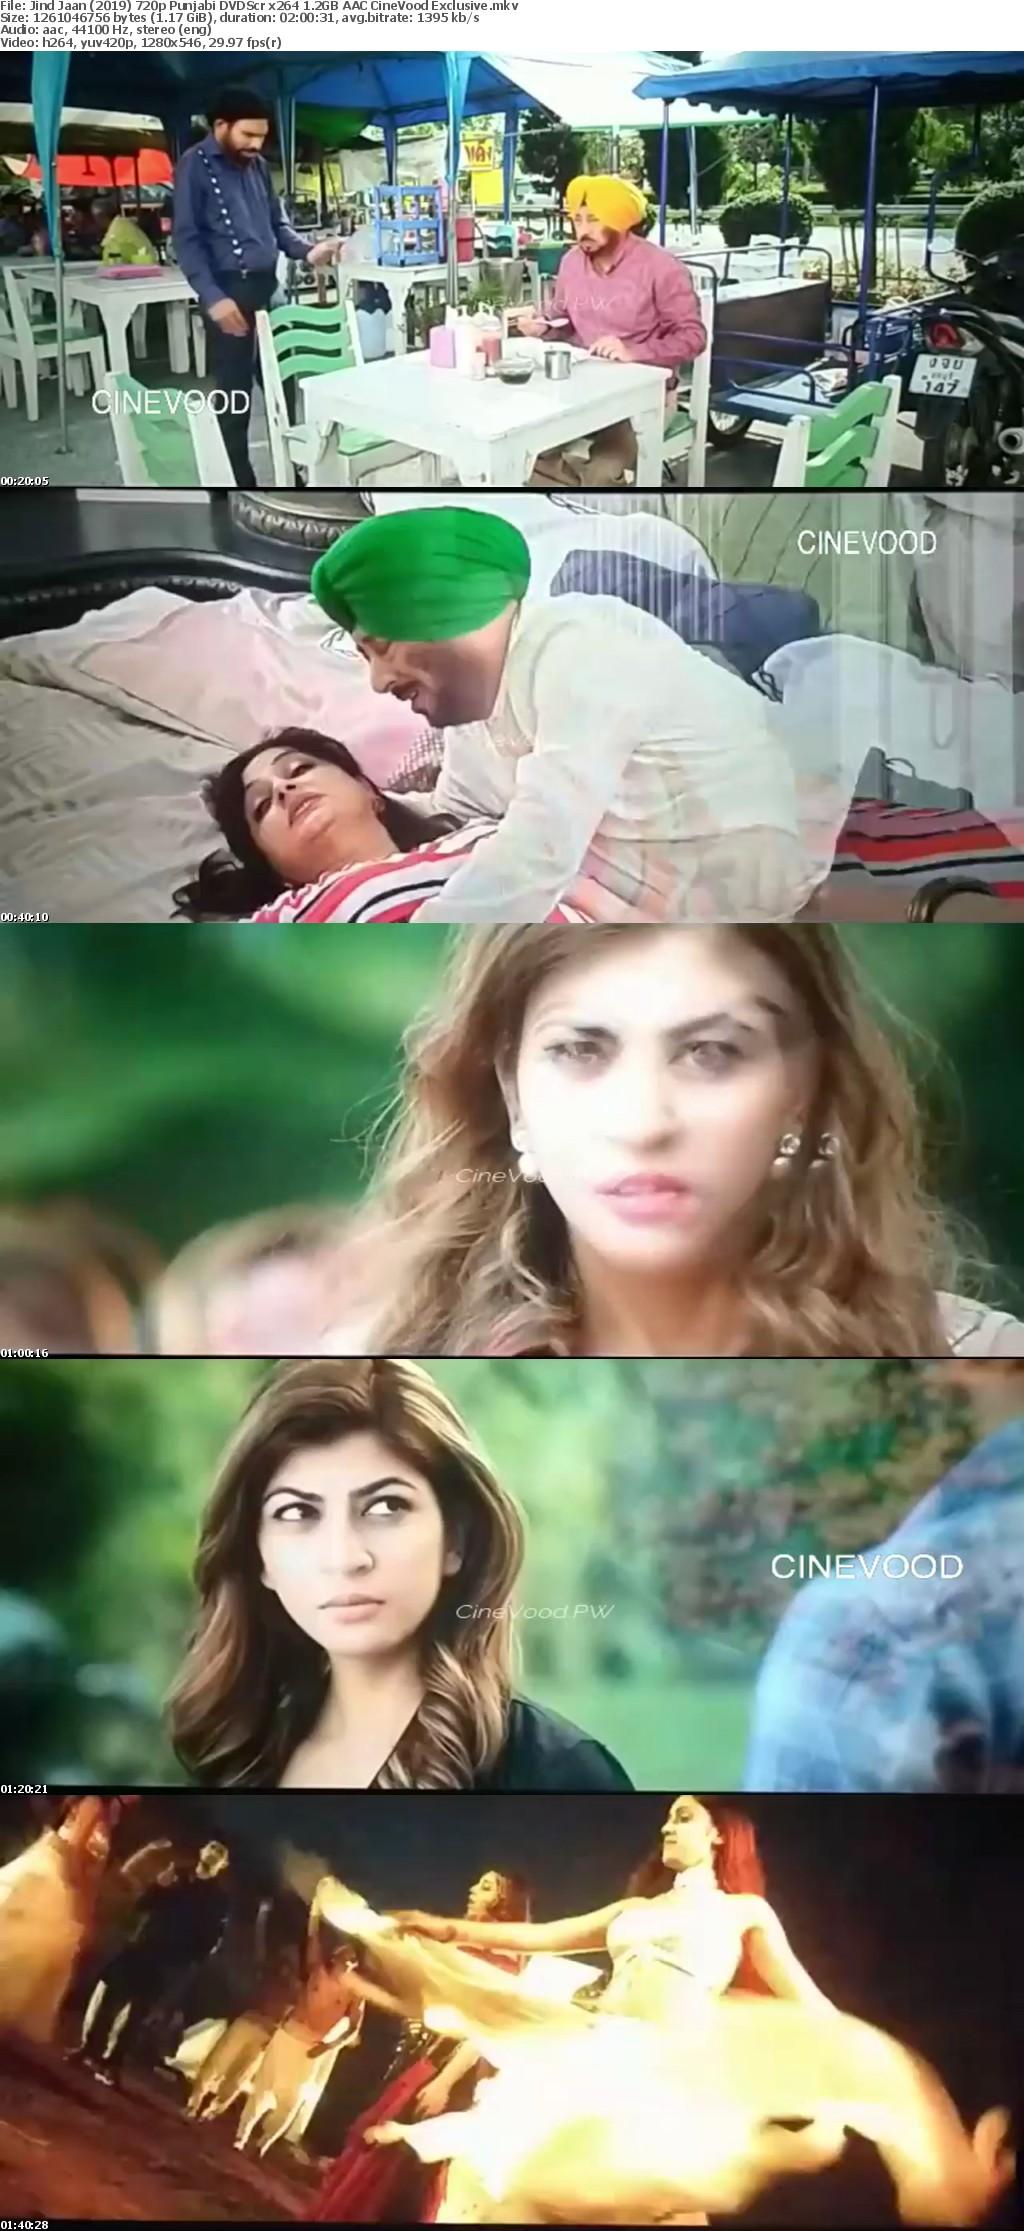 Jind Jaan 2019 720p Punjabi DVDScr x264 1 2GB AAC CineVood Exclusive